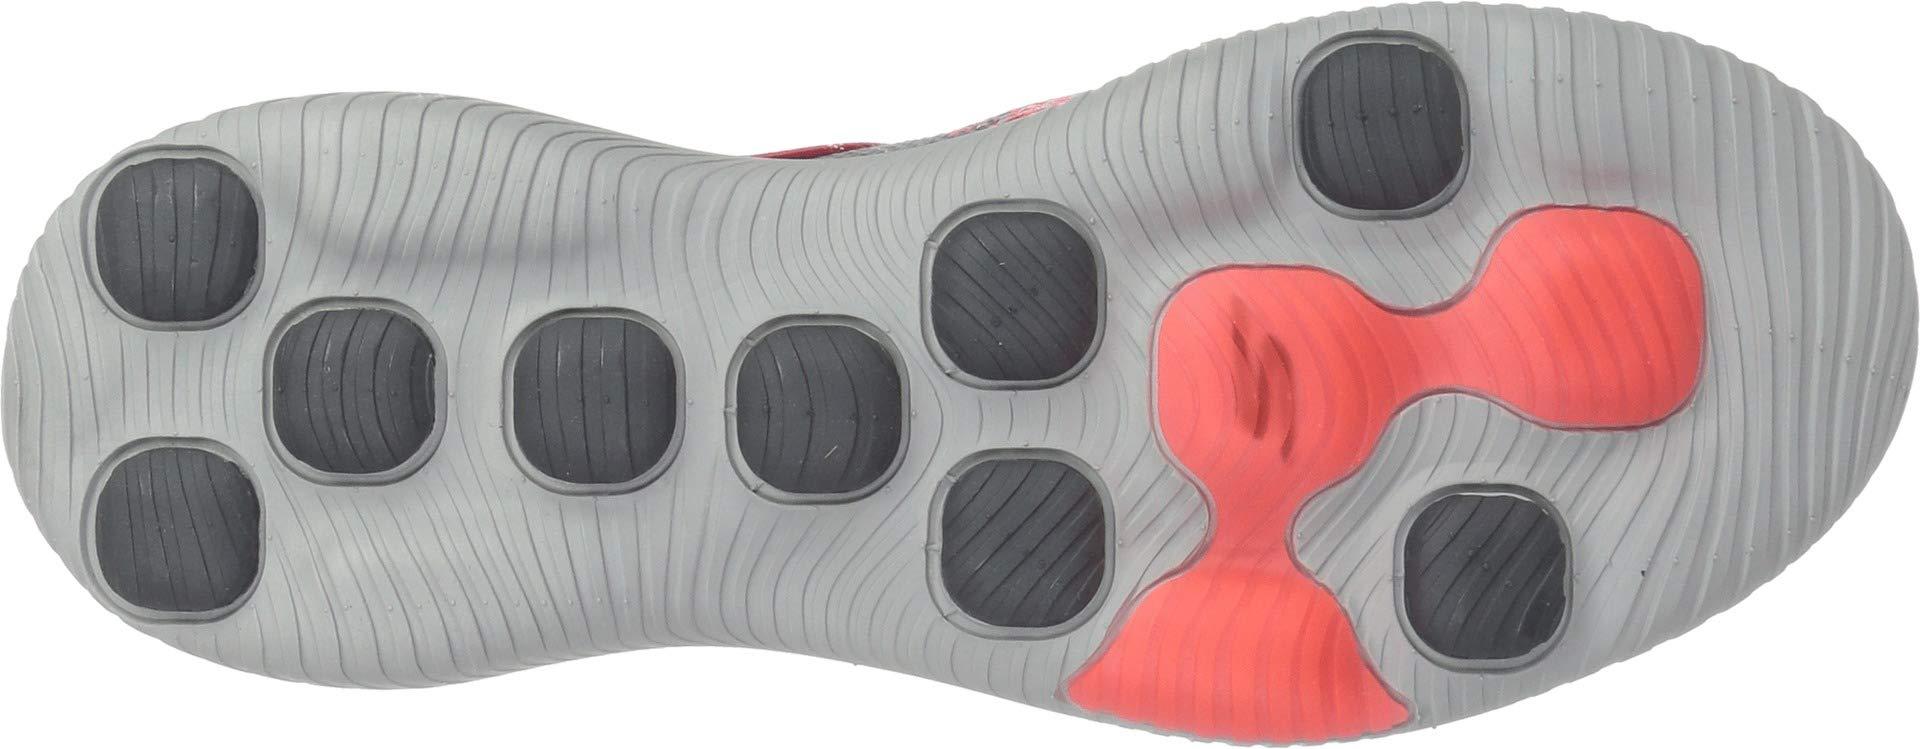 Skechers Performance Women's GO Walk Revolution Ultra-15669 Sneaker,Charcoal/hot Pink,8 M US by Skechers (Image #3)